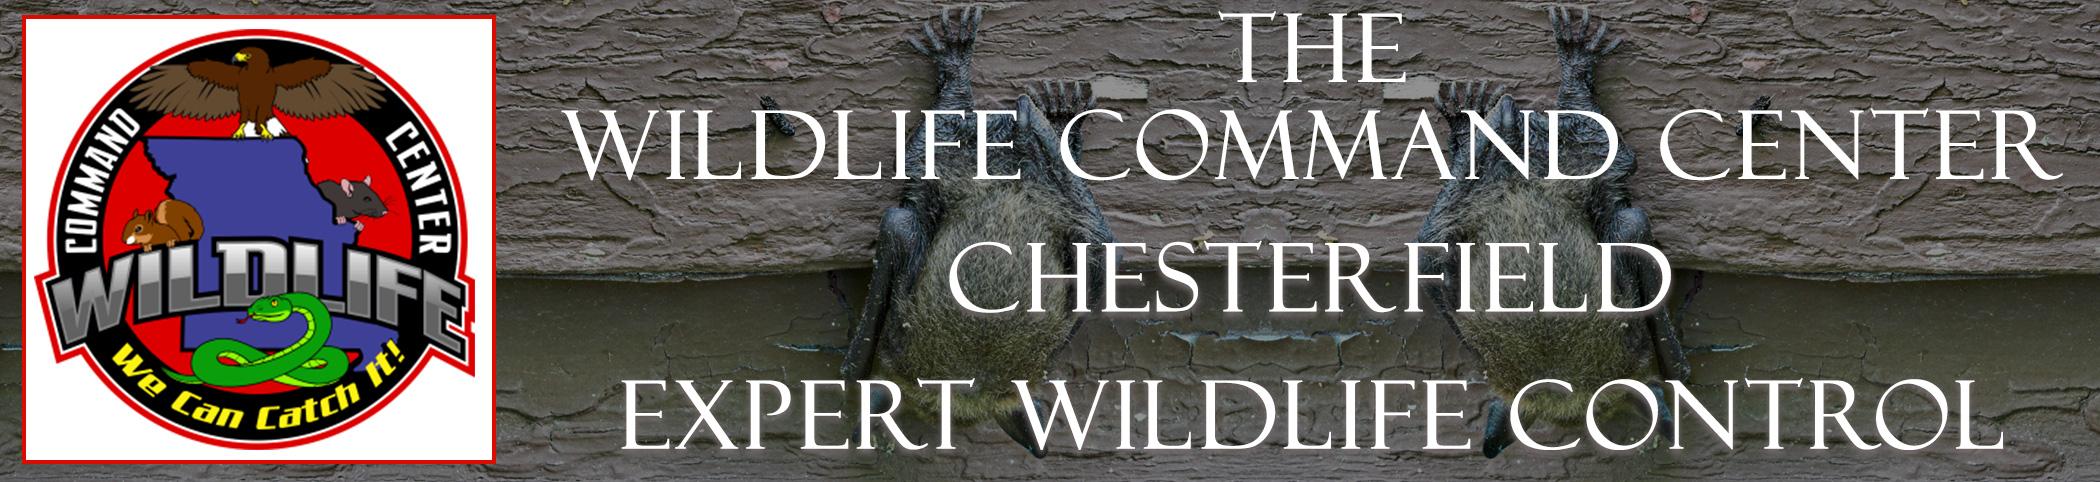 The Wildlife Command Center Chesterfield Missouri Image